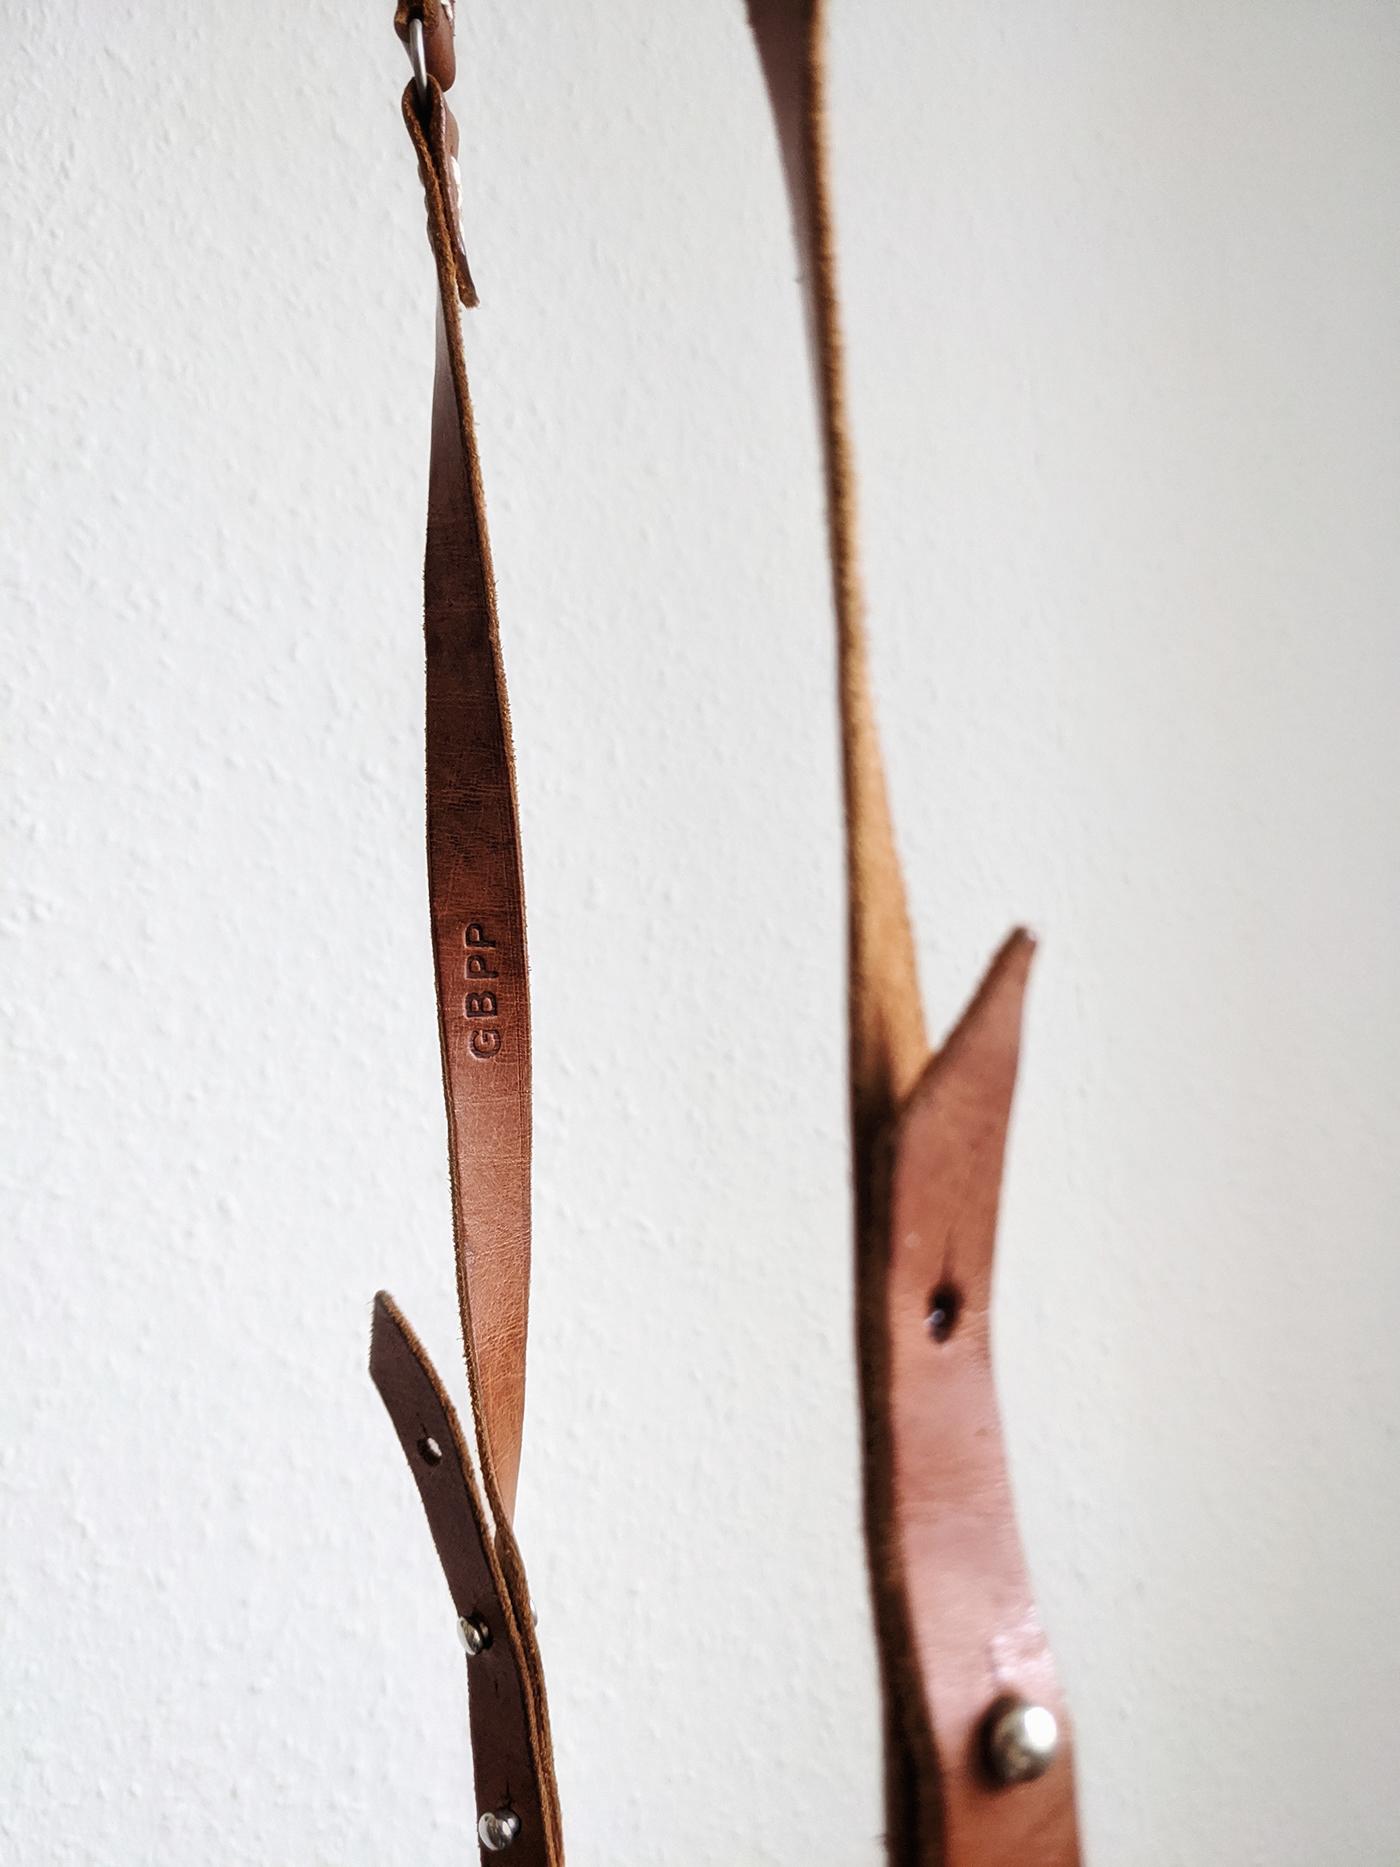 handcrafting handmade product design